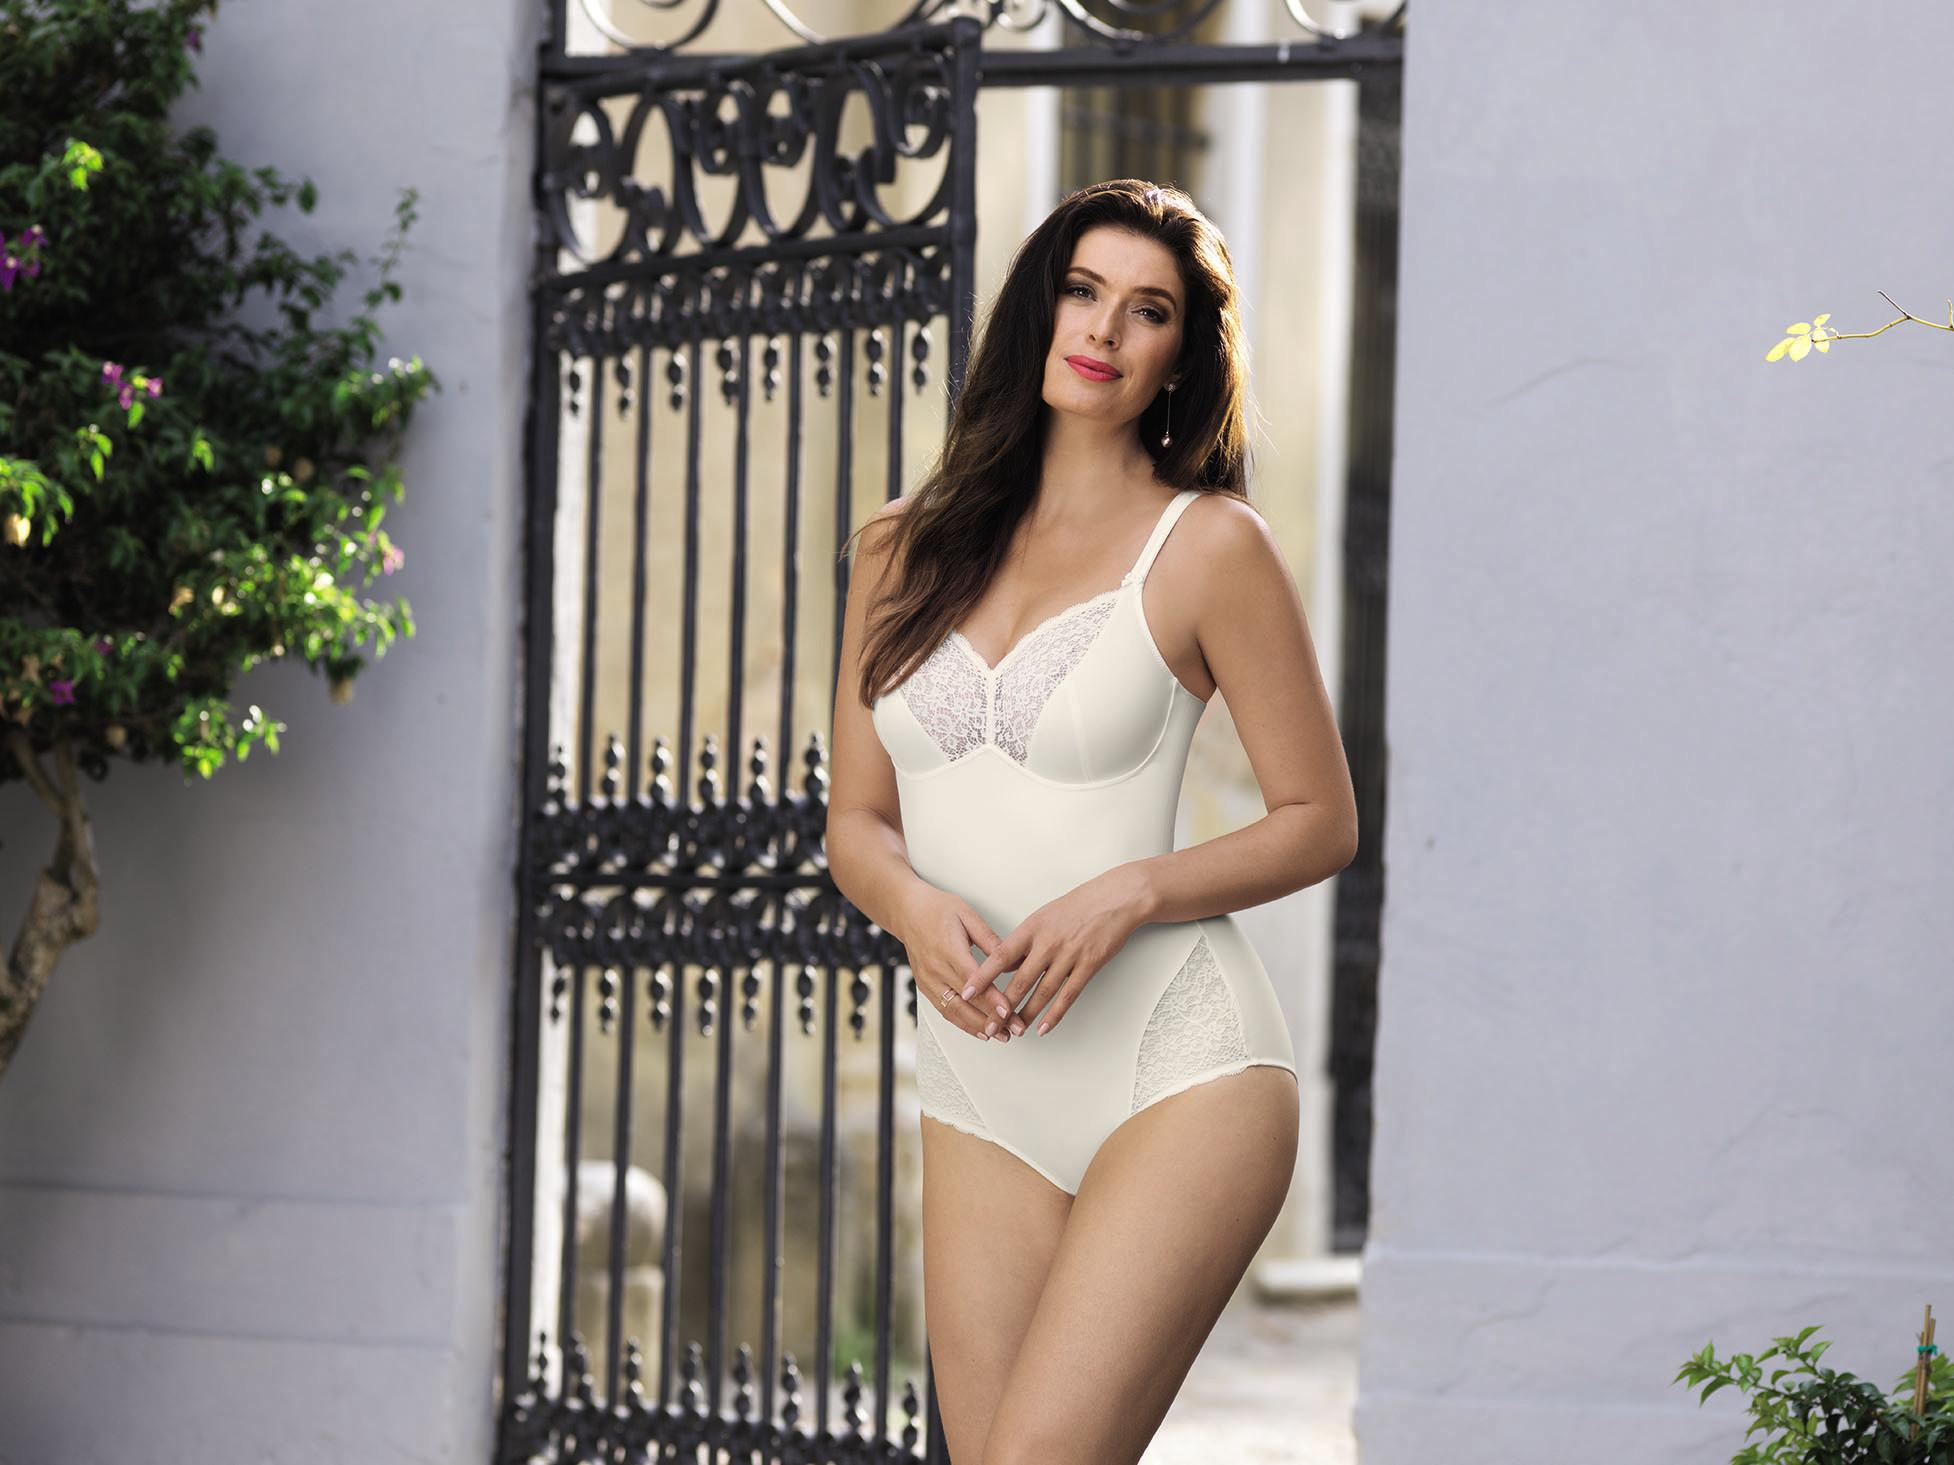 Anita comfort Body Havanna